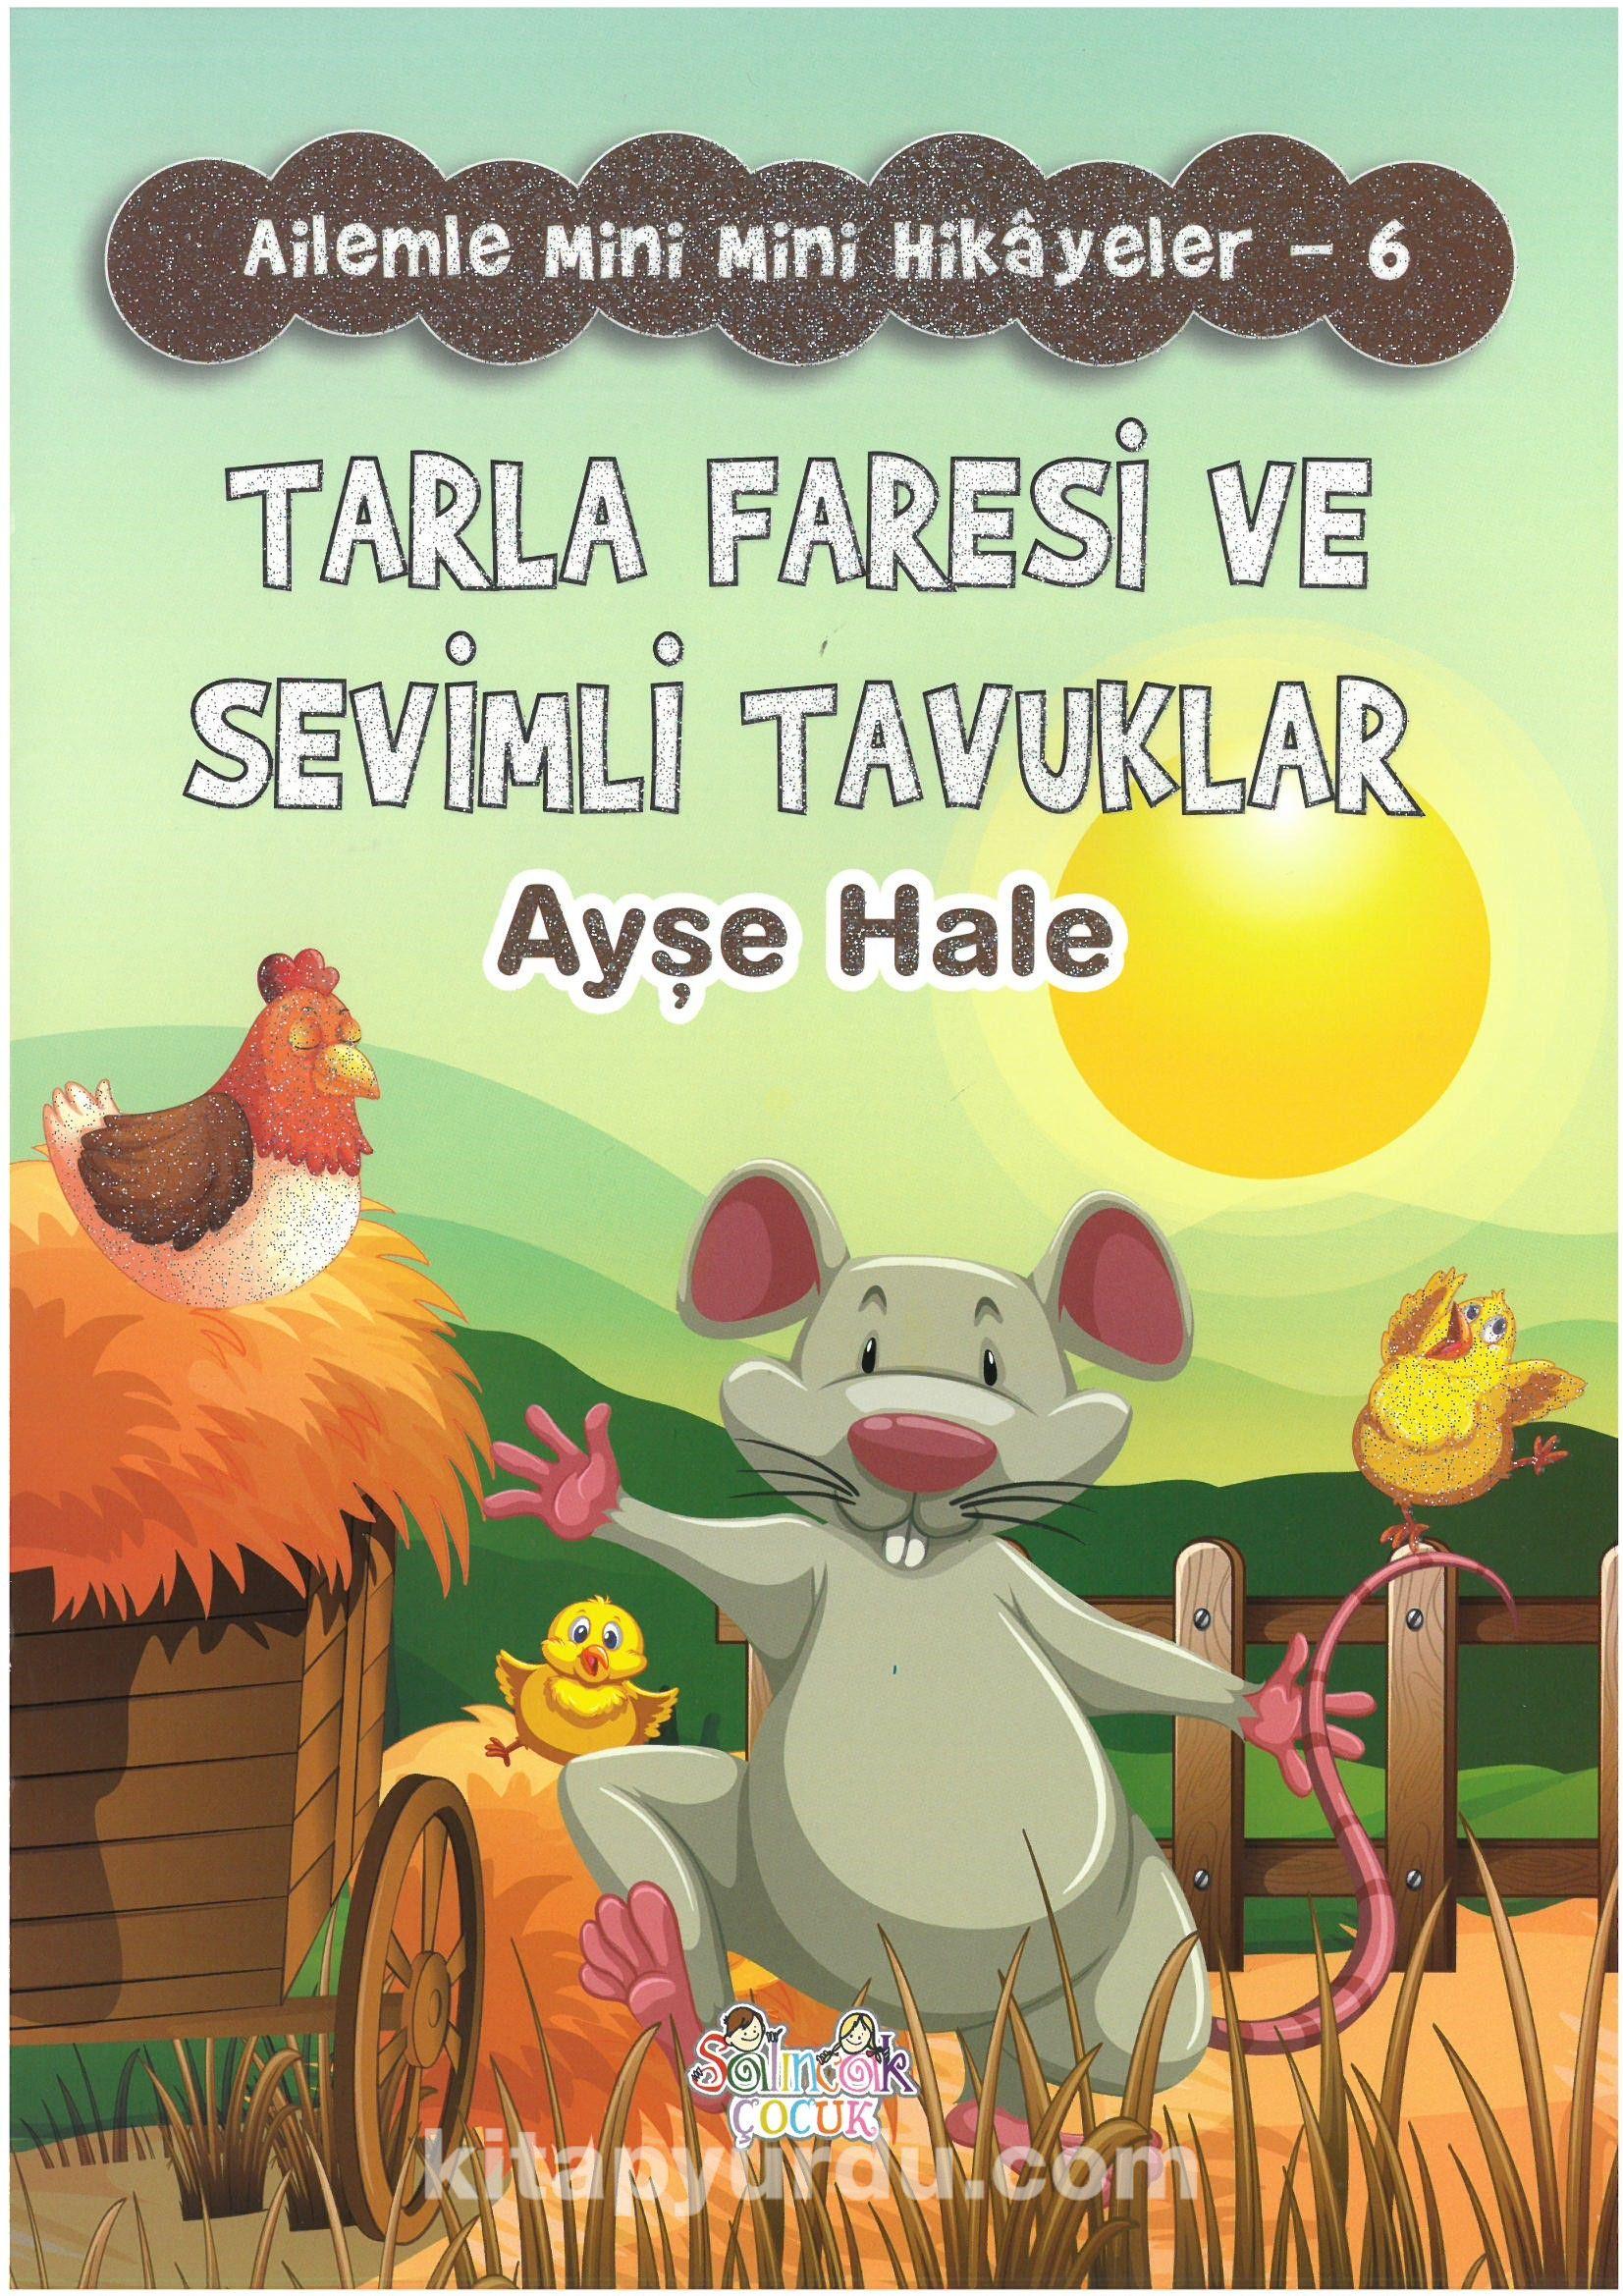 Tarla Faresi ve Sevimli Tavuklar / Ailemle Mini Mini Hikayeler 6 - Ayşe Hale Ortadeveci pdf epub